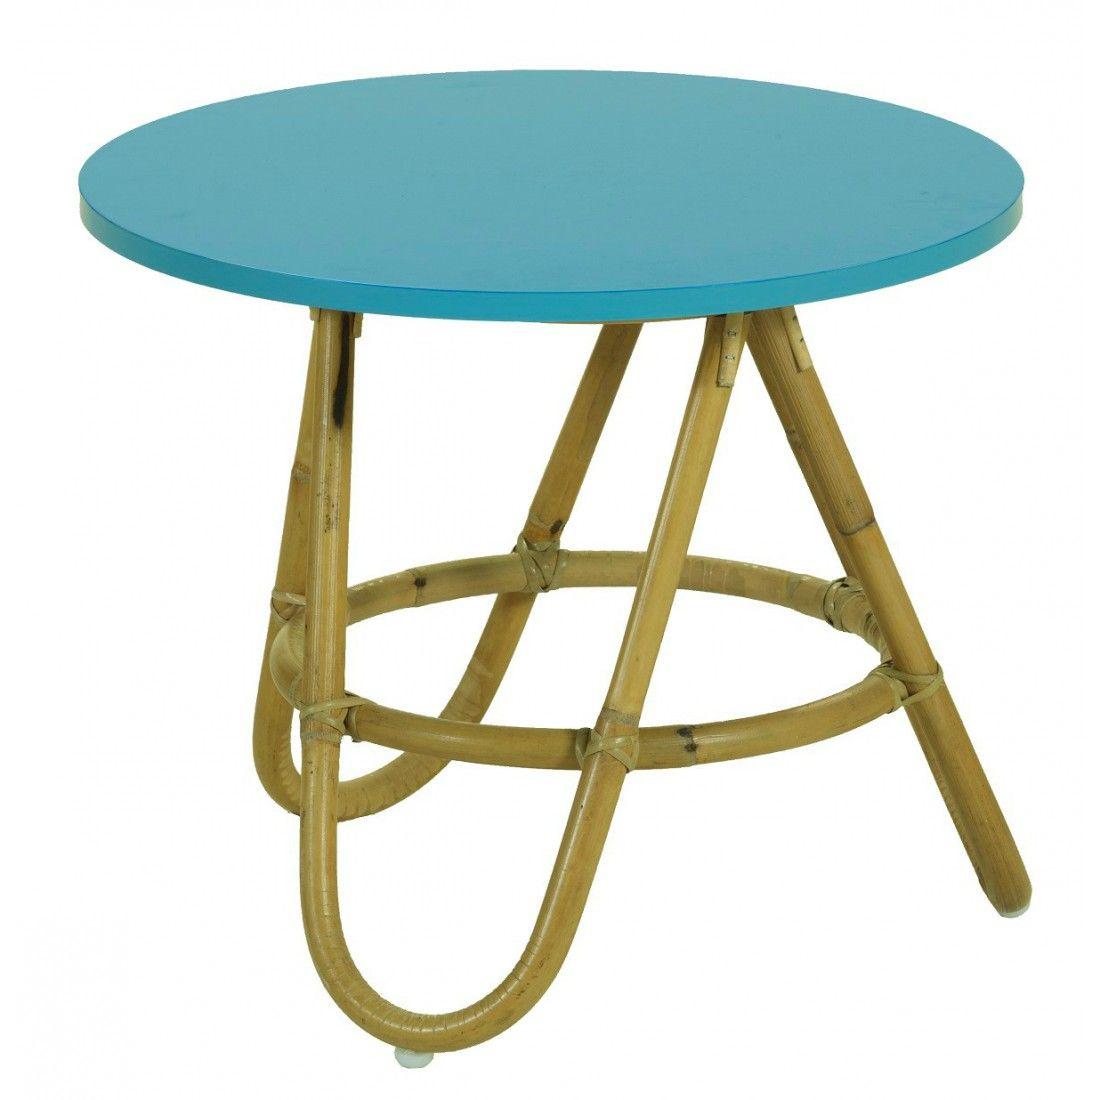 Table basse tous les fournisseurs rectangulaire pied for Table rotin plateau verre